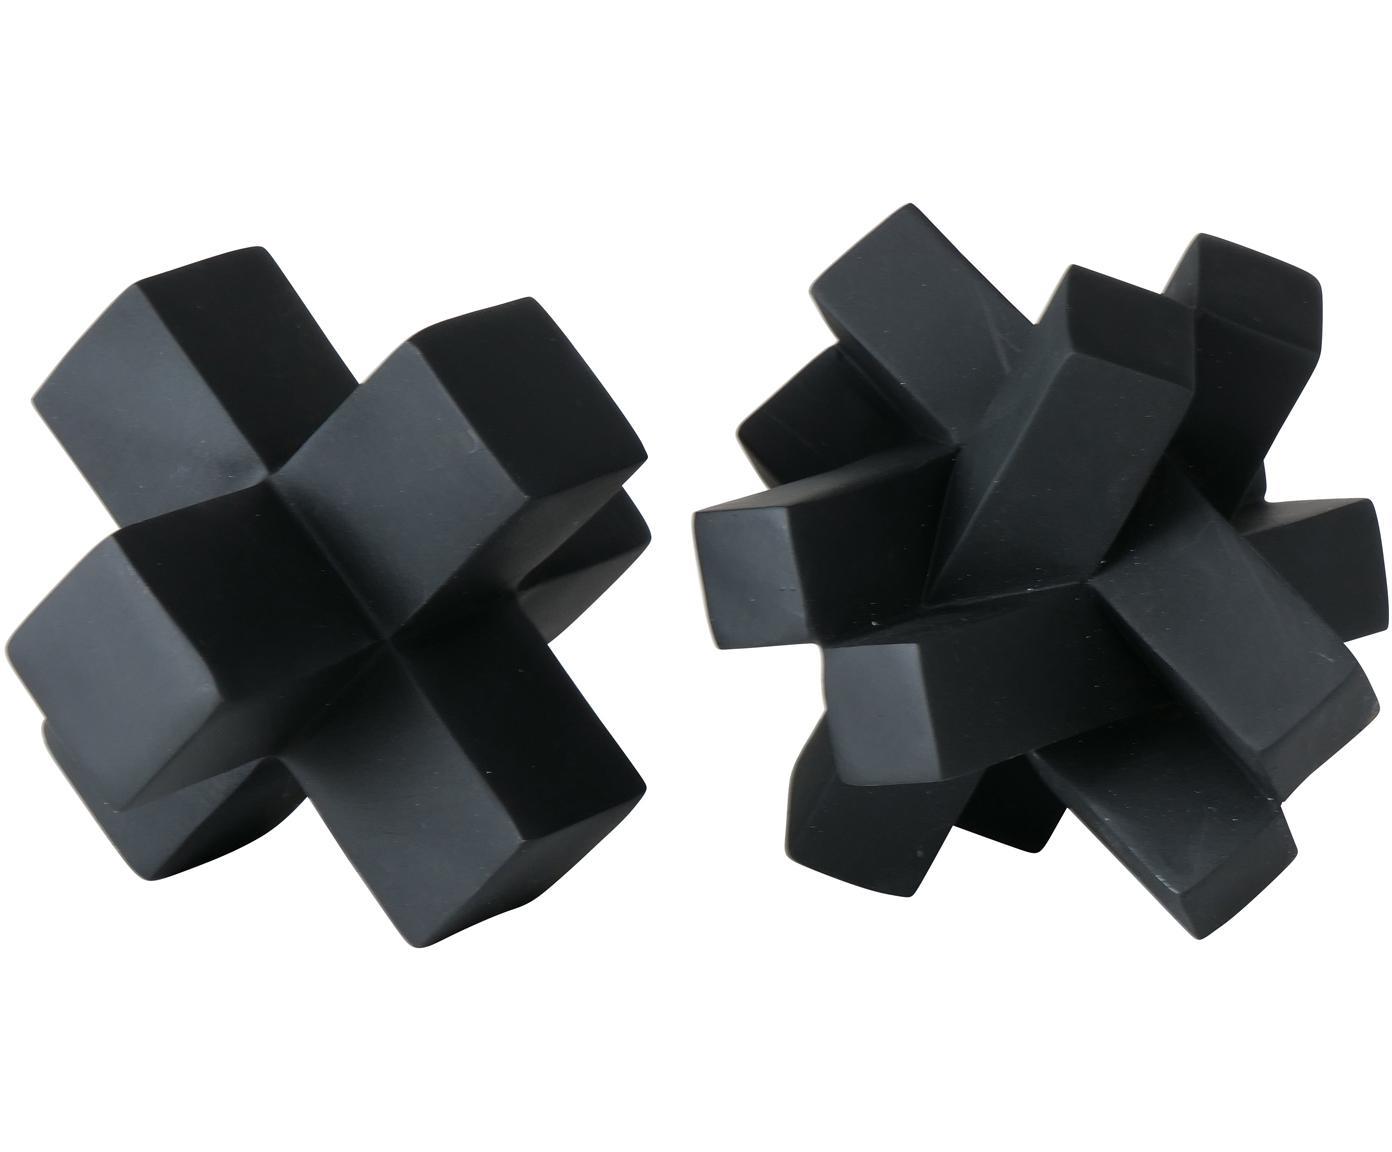 Deko-Objekte-Set Crossy, 2-tlg., Kunststoff, Schwarz, 10 x 10 cm